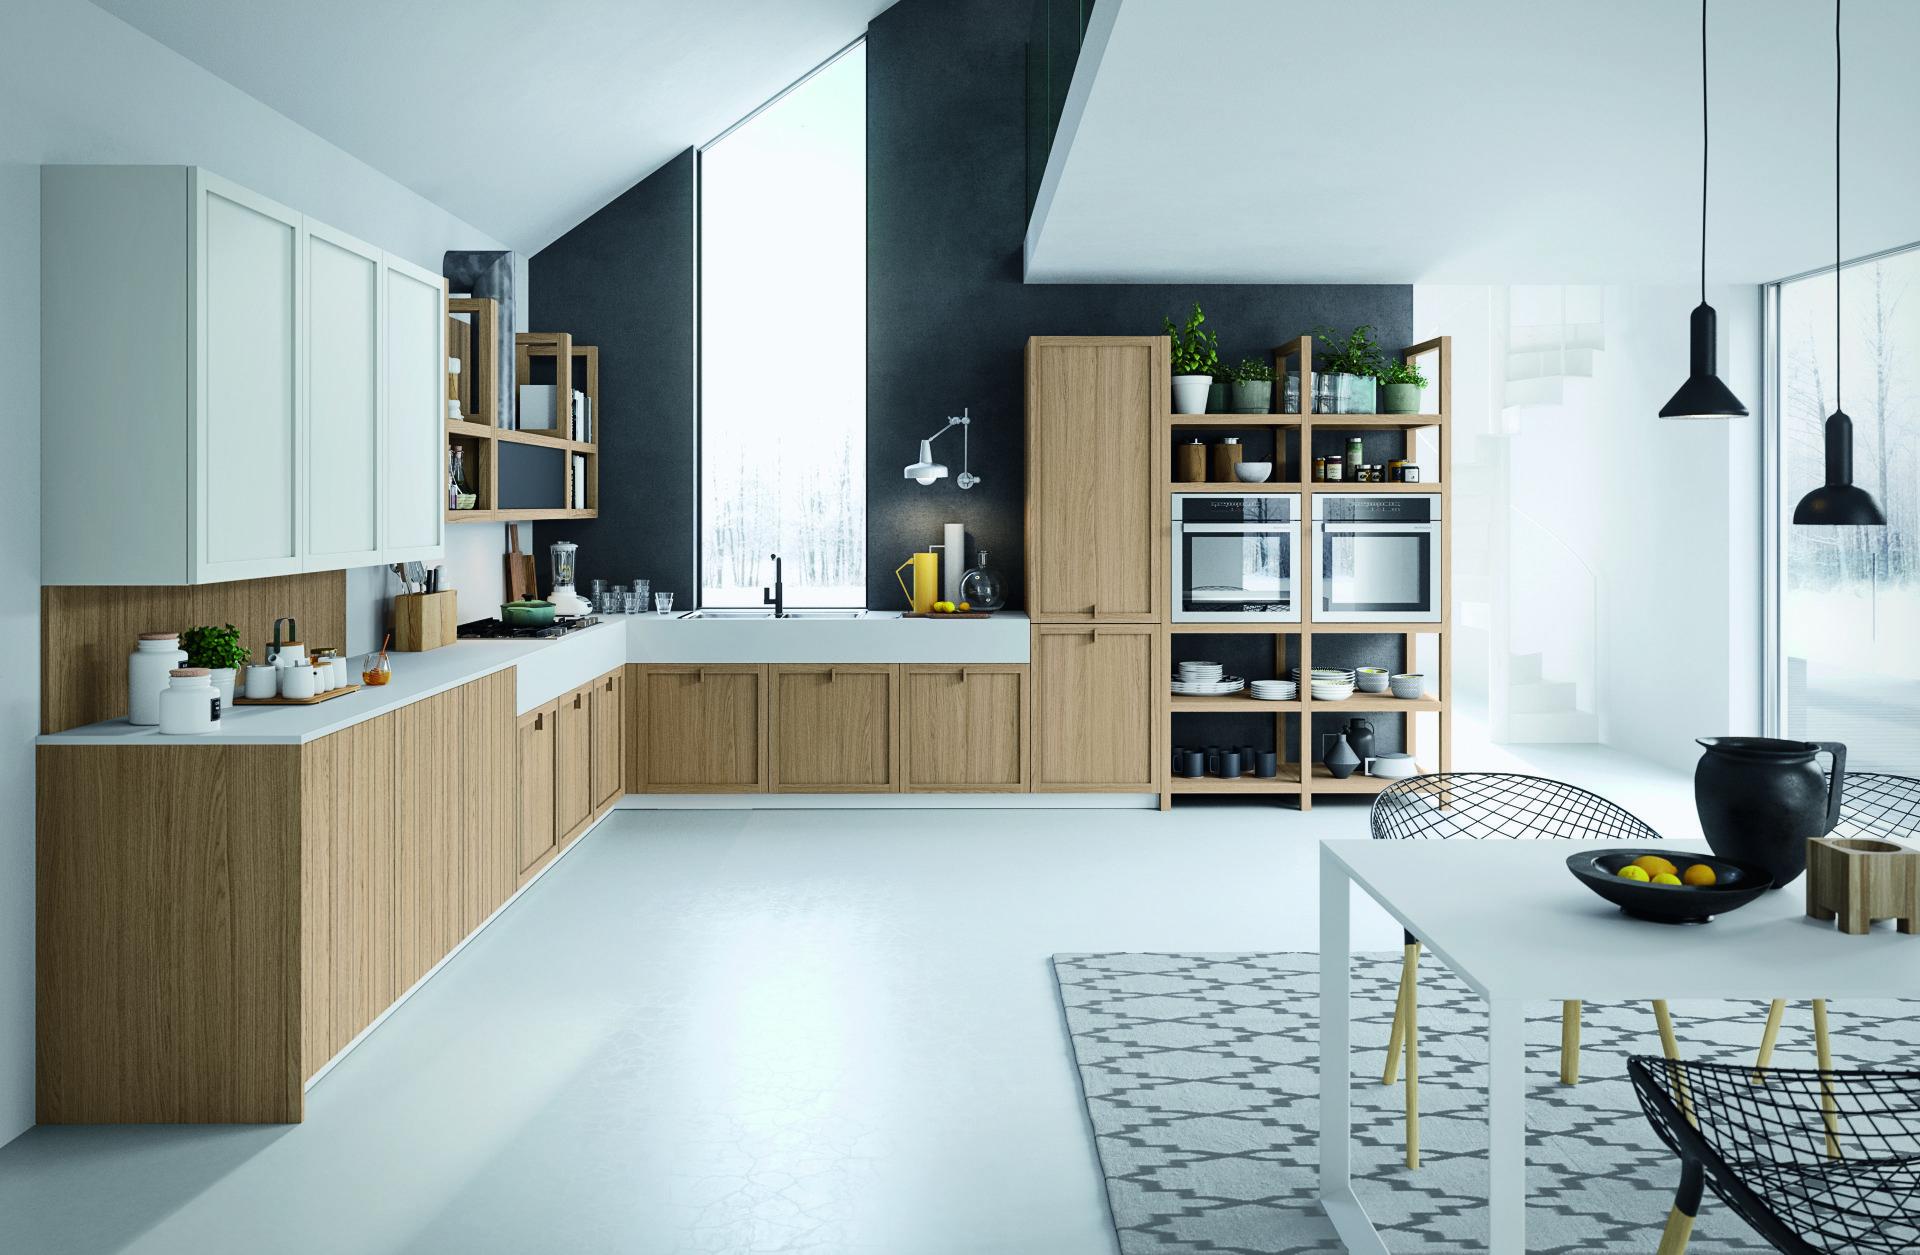 Vendita cucine bergamo l 39 artigiana del mobile - Cucine dibiesse ...